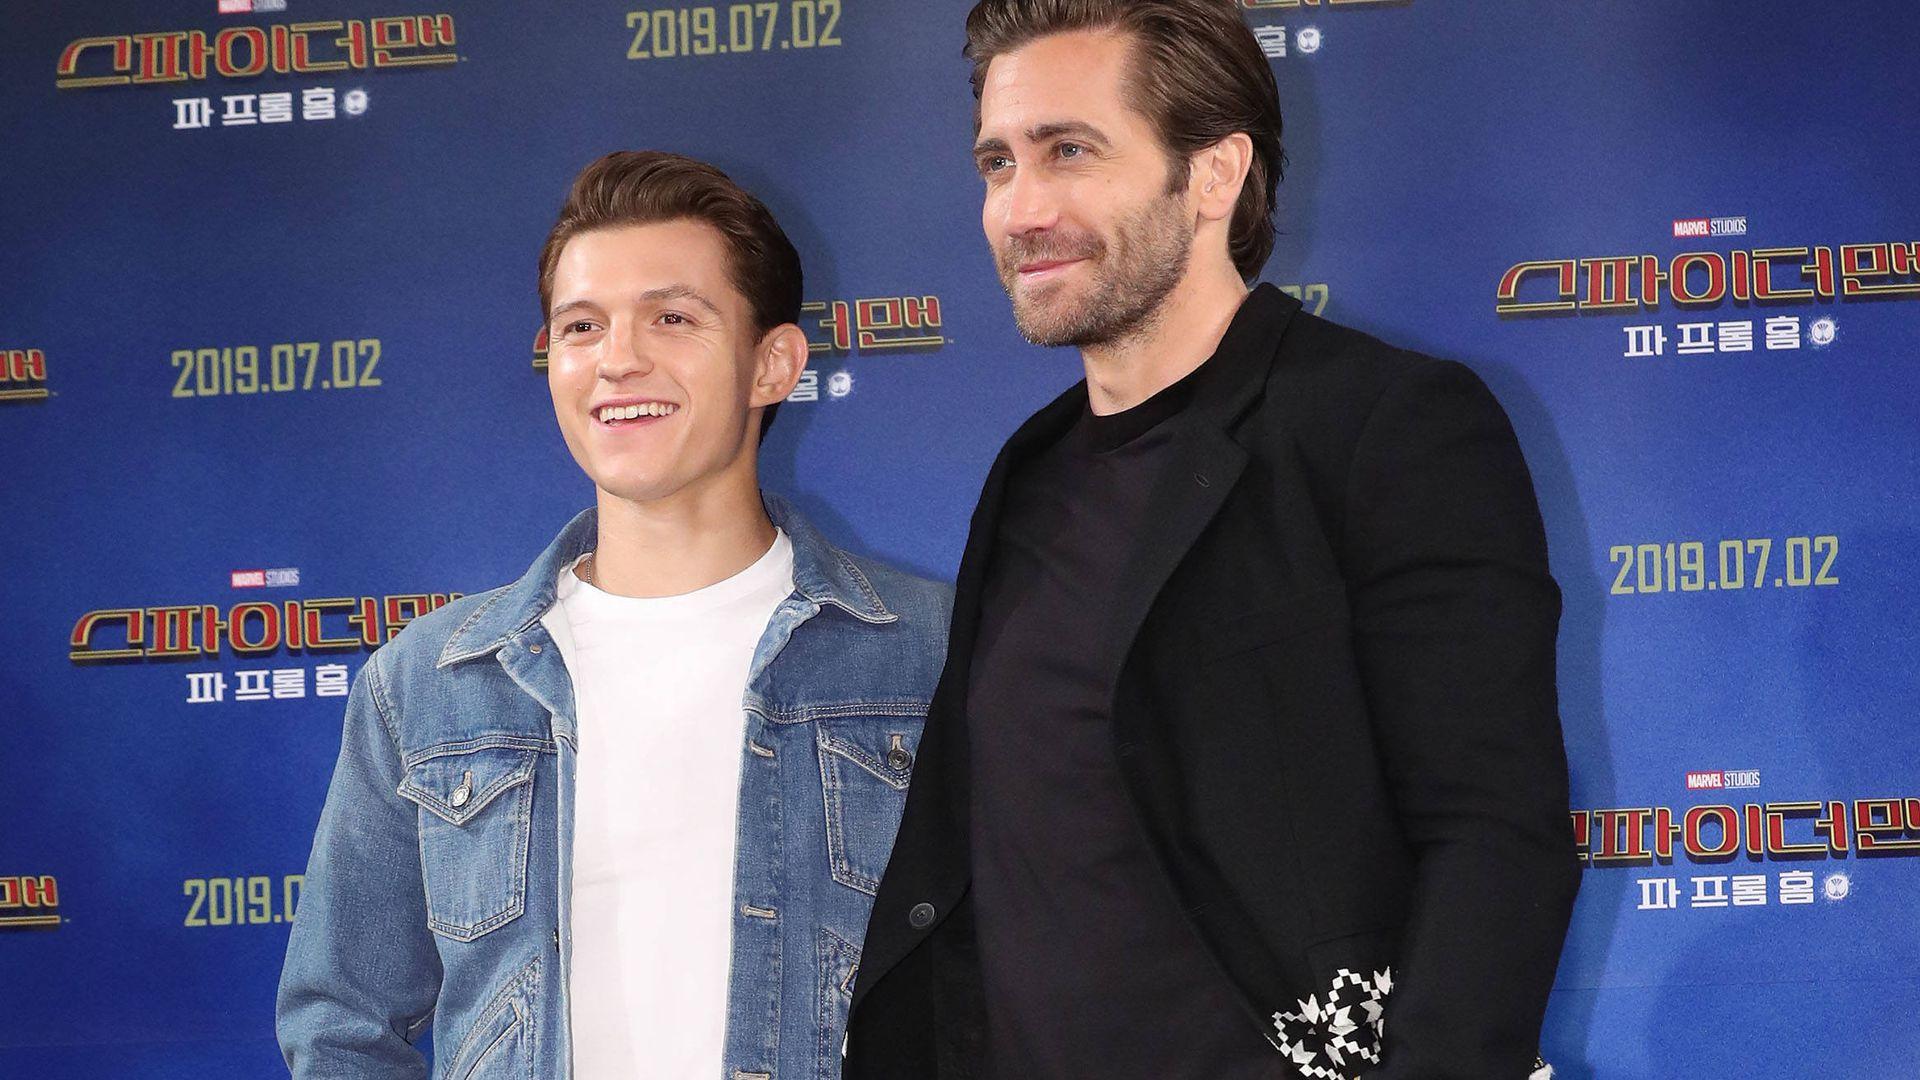 Freundin jake gyllenhaal Jake Gyllenhaal,